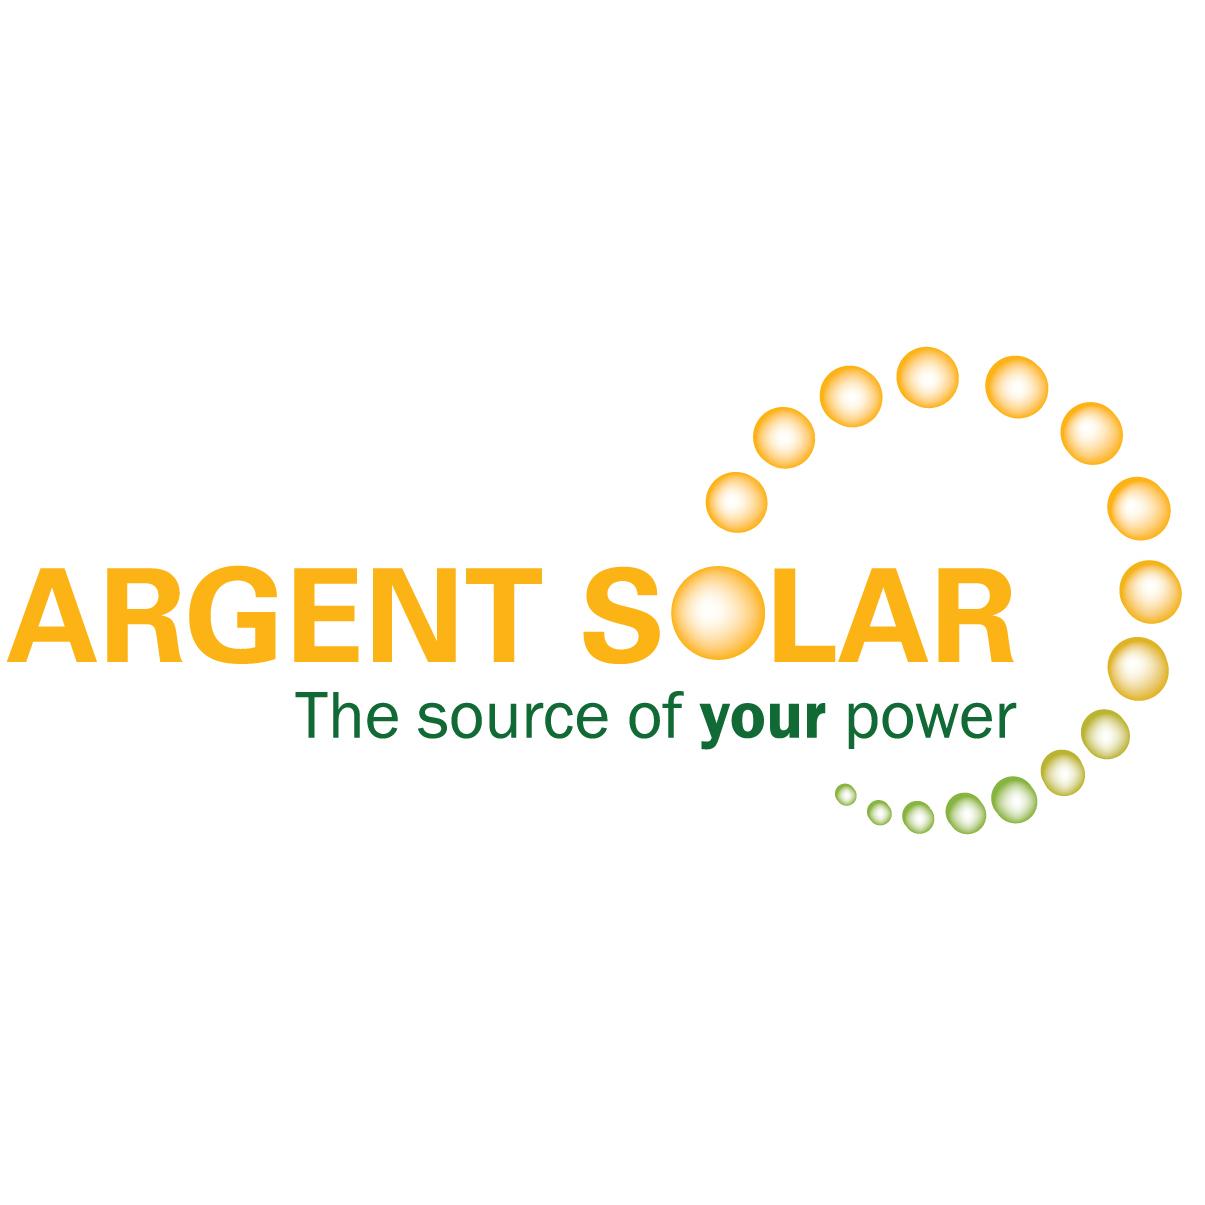 Argent Solar Electric image 2